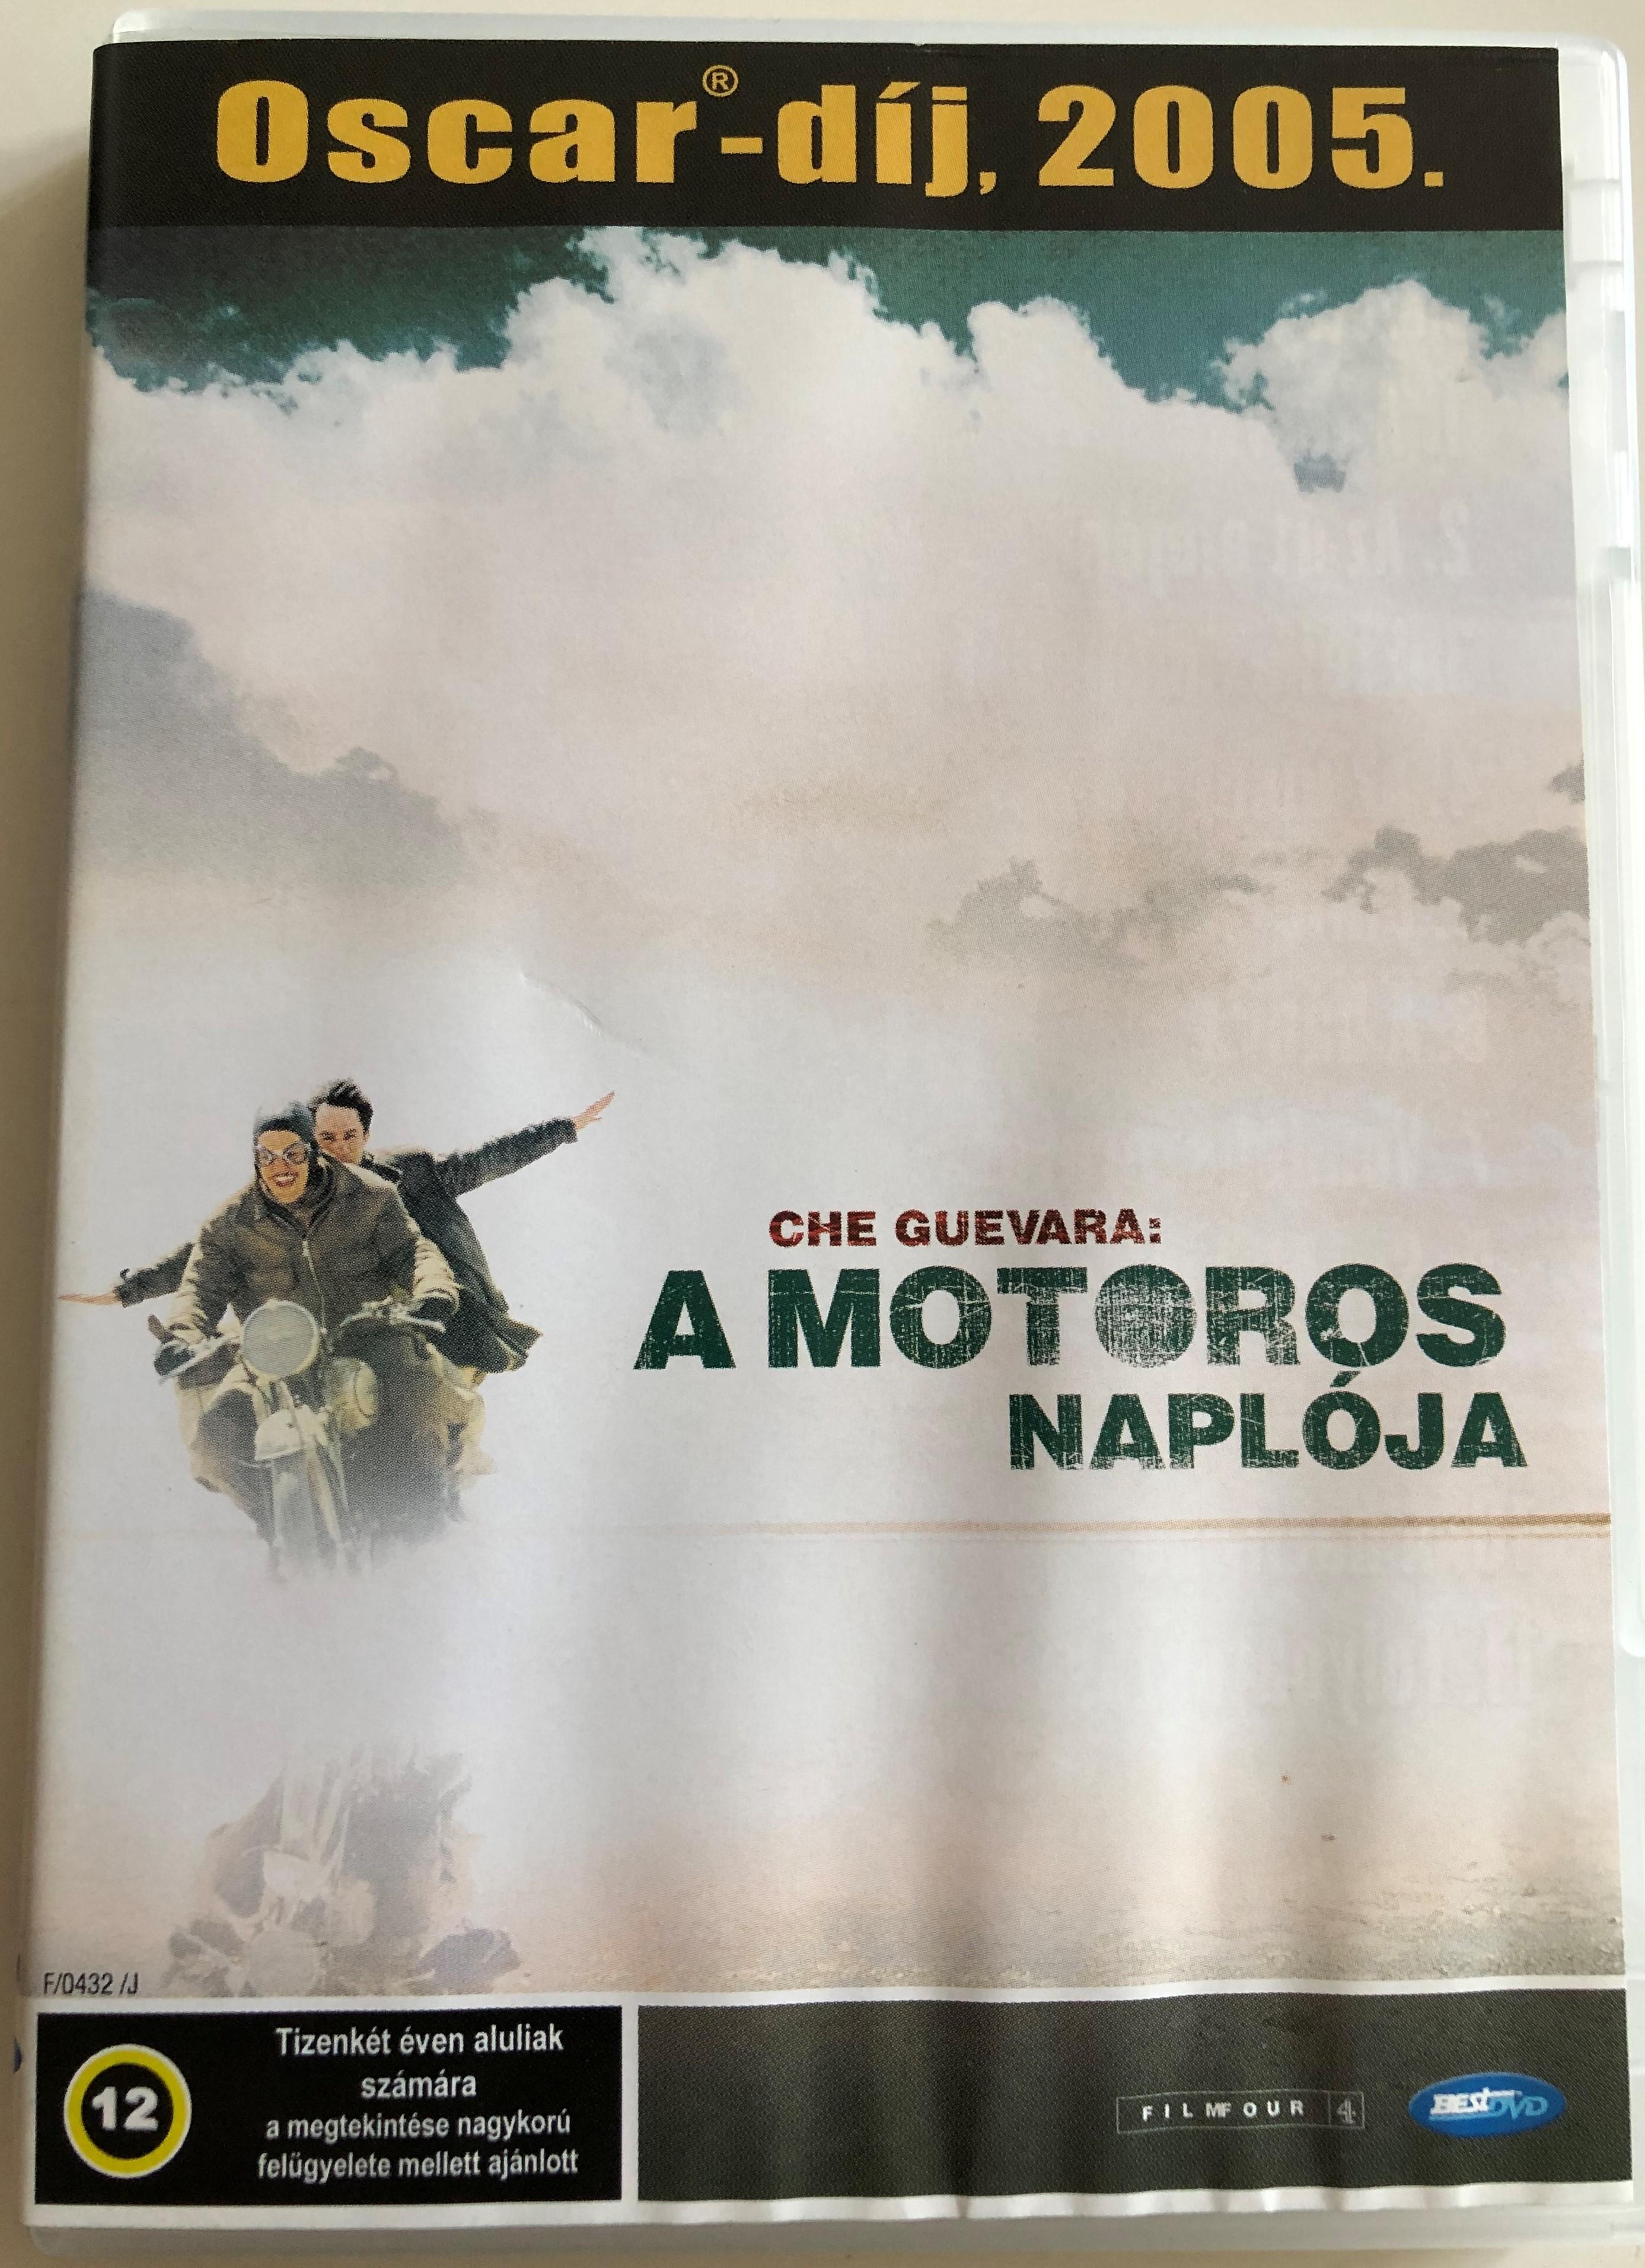 diarios-de-motocicleta-dvd-2004-che-guevara-a-motoros-napl-ja-the-motorcycle-diaries-directed-by-walter-salles-starring-gael-garcia-bernal-rodrigo-de-la-serna-mercedes-mor-n-jean-pierre-noher-facundo-espinosa-1-.jpg